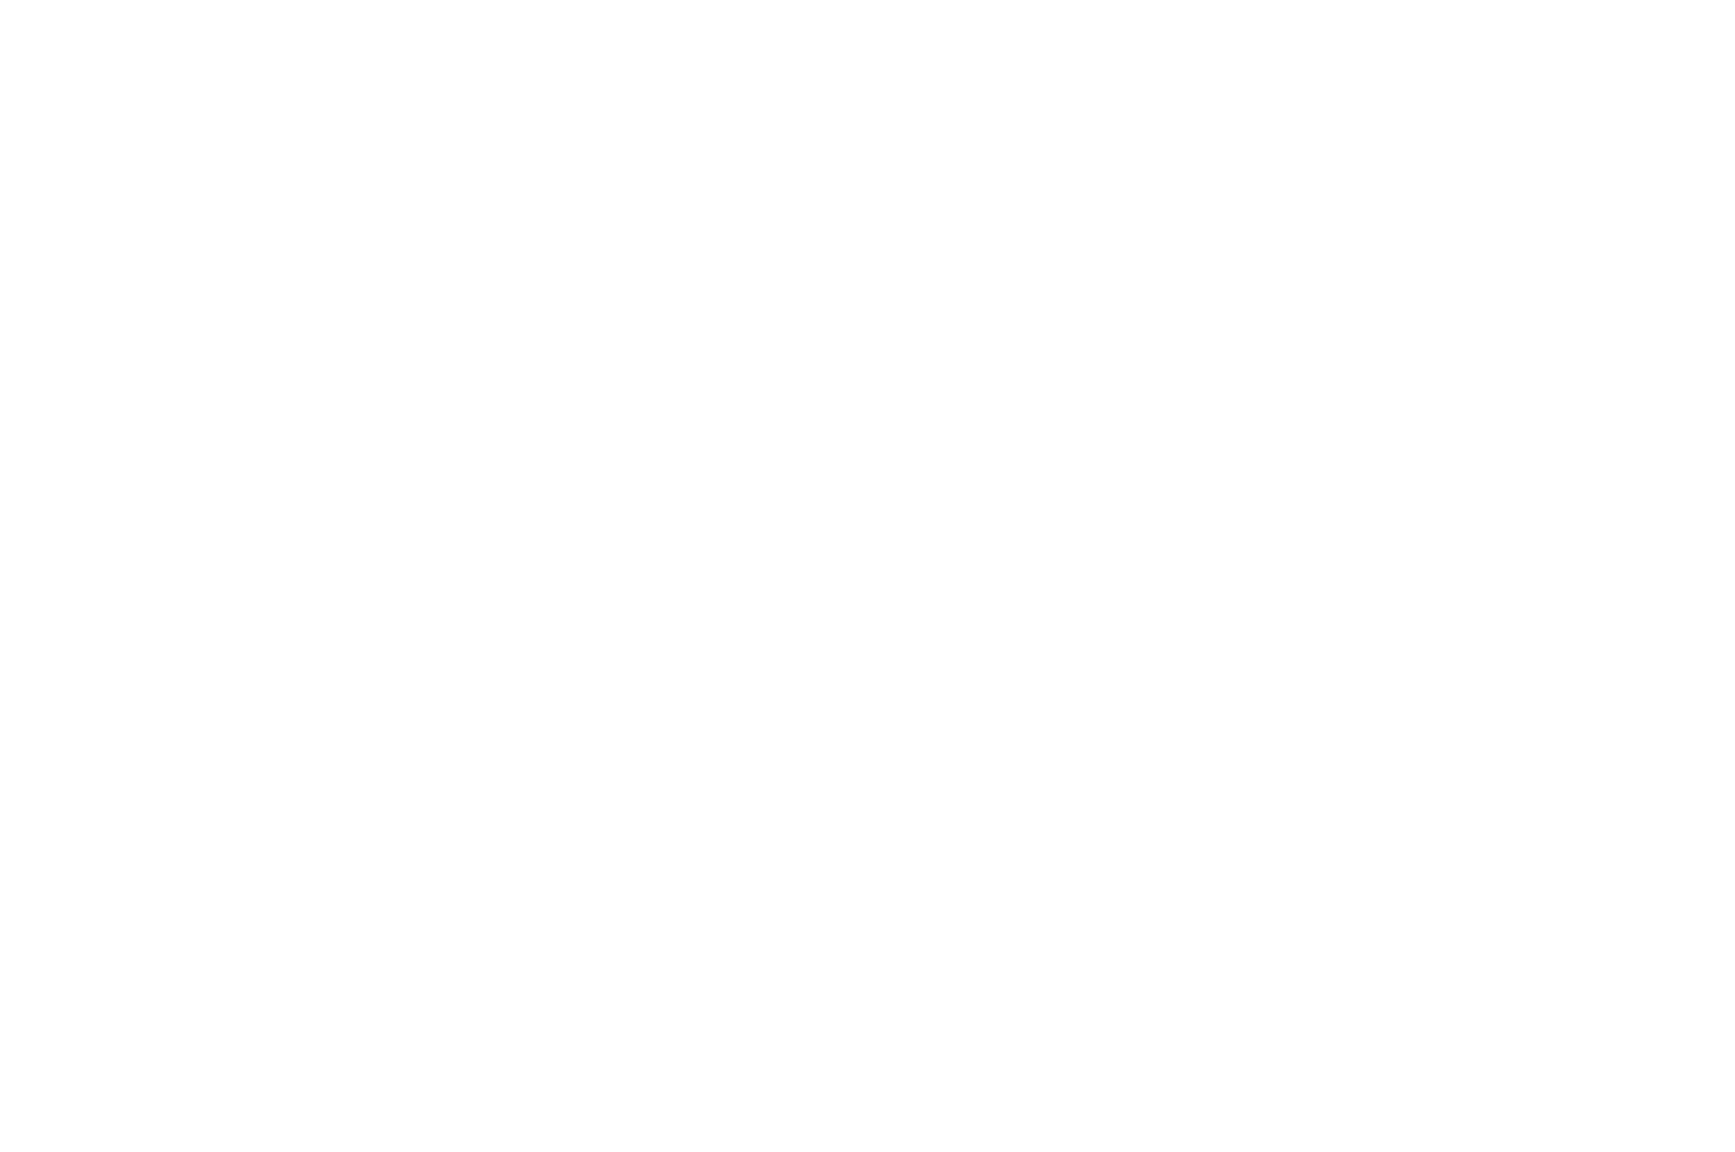 Rockport Film Festival